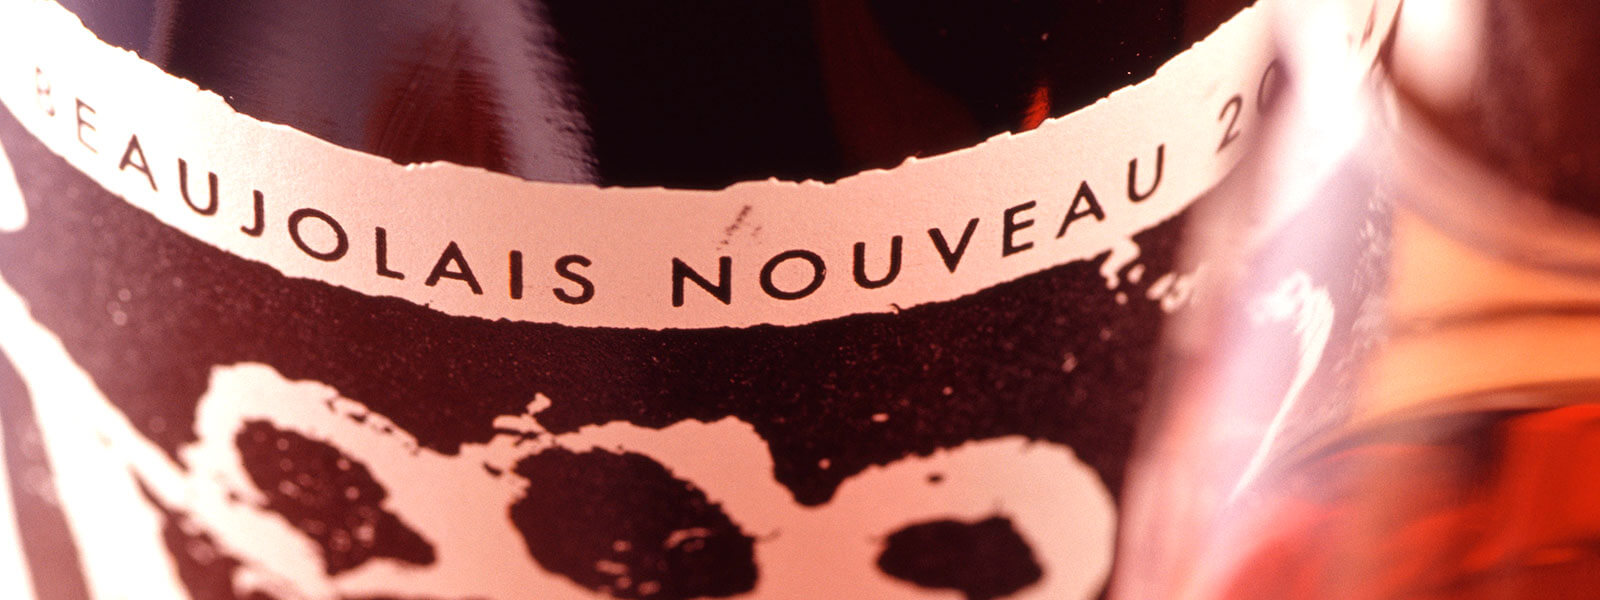 Kanpai Tourisme - Beaujolais Nouveau Evening Release